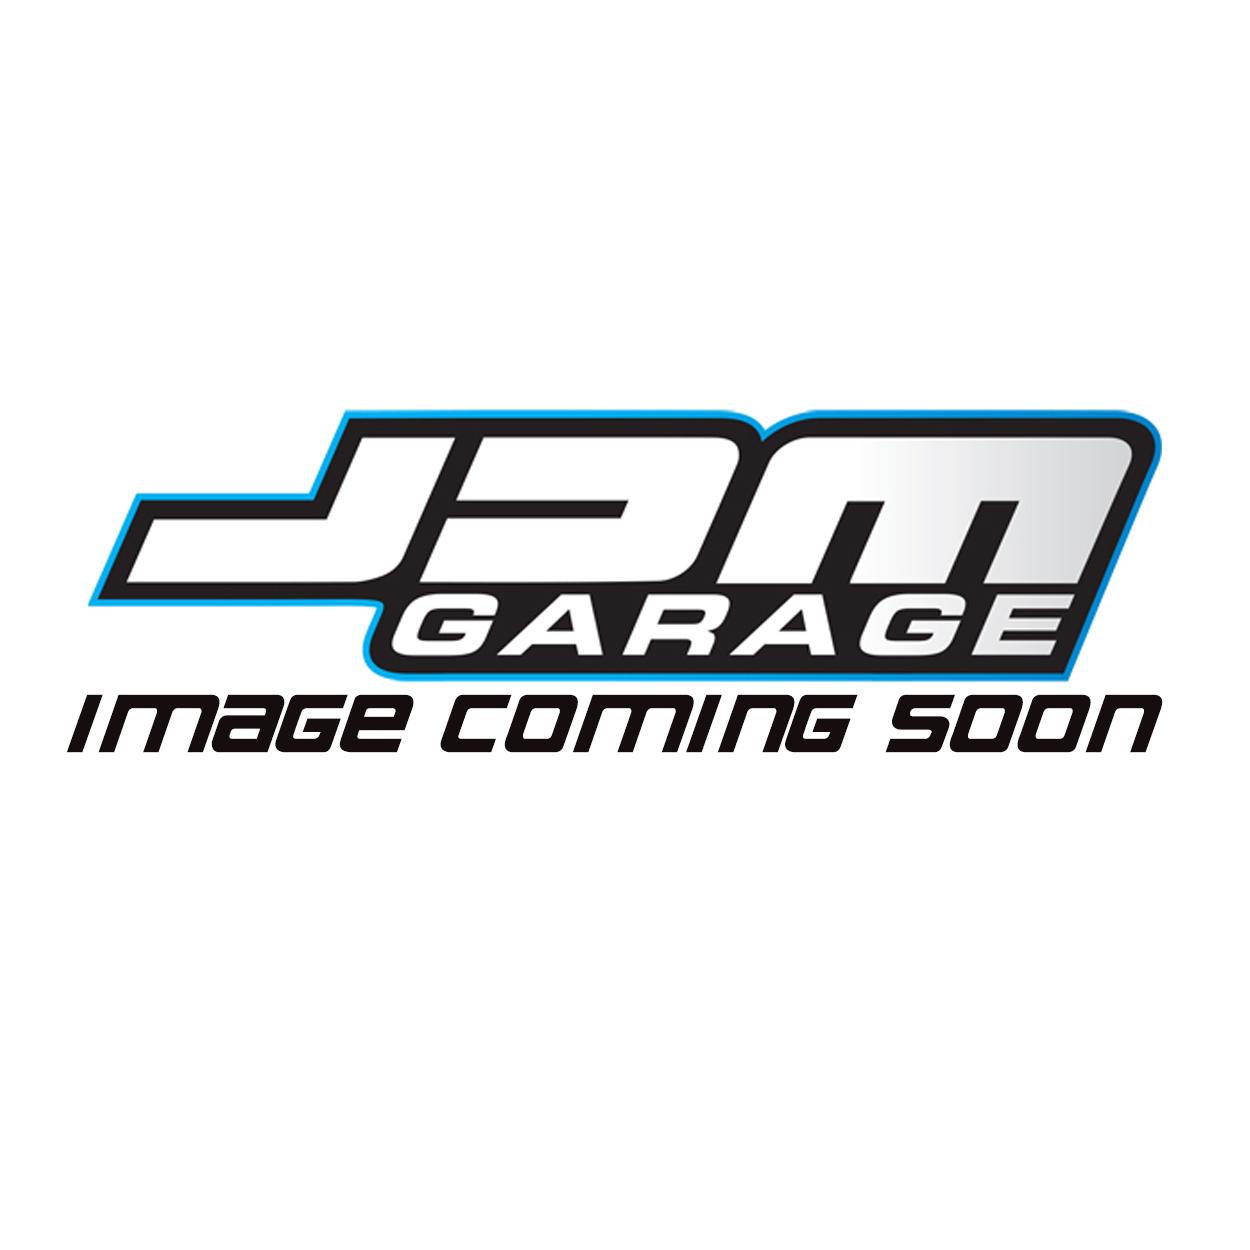 JDM Garage Logo Sticker - Glitter - Blue / Gold / Red / Silver